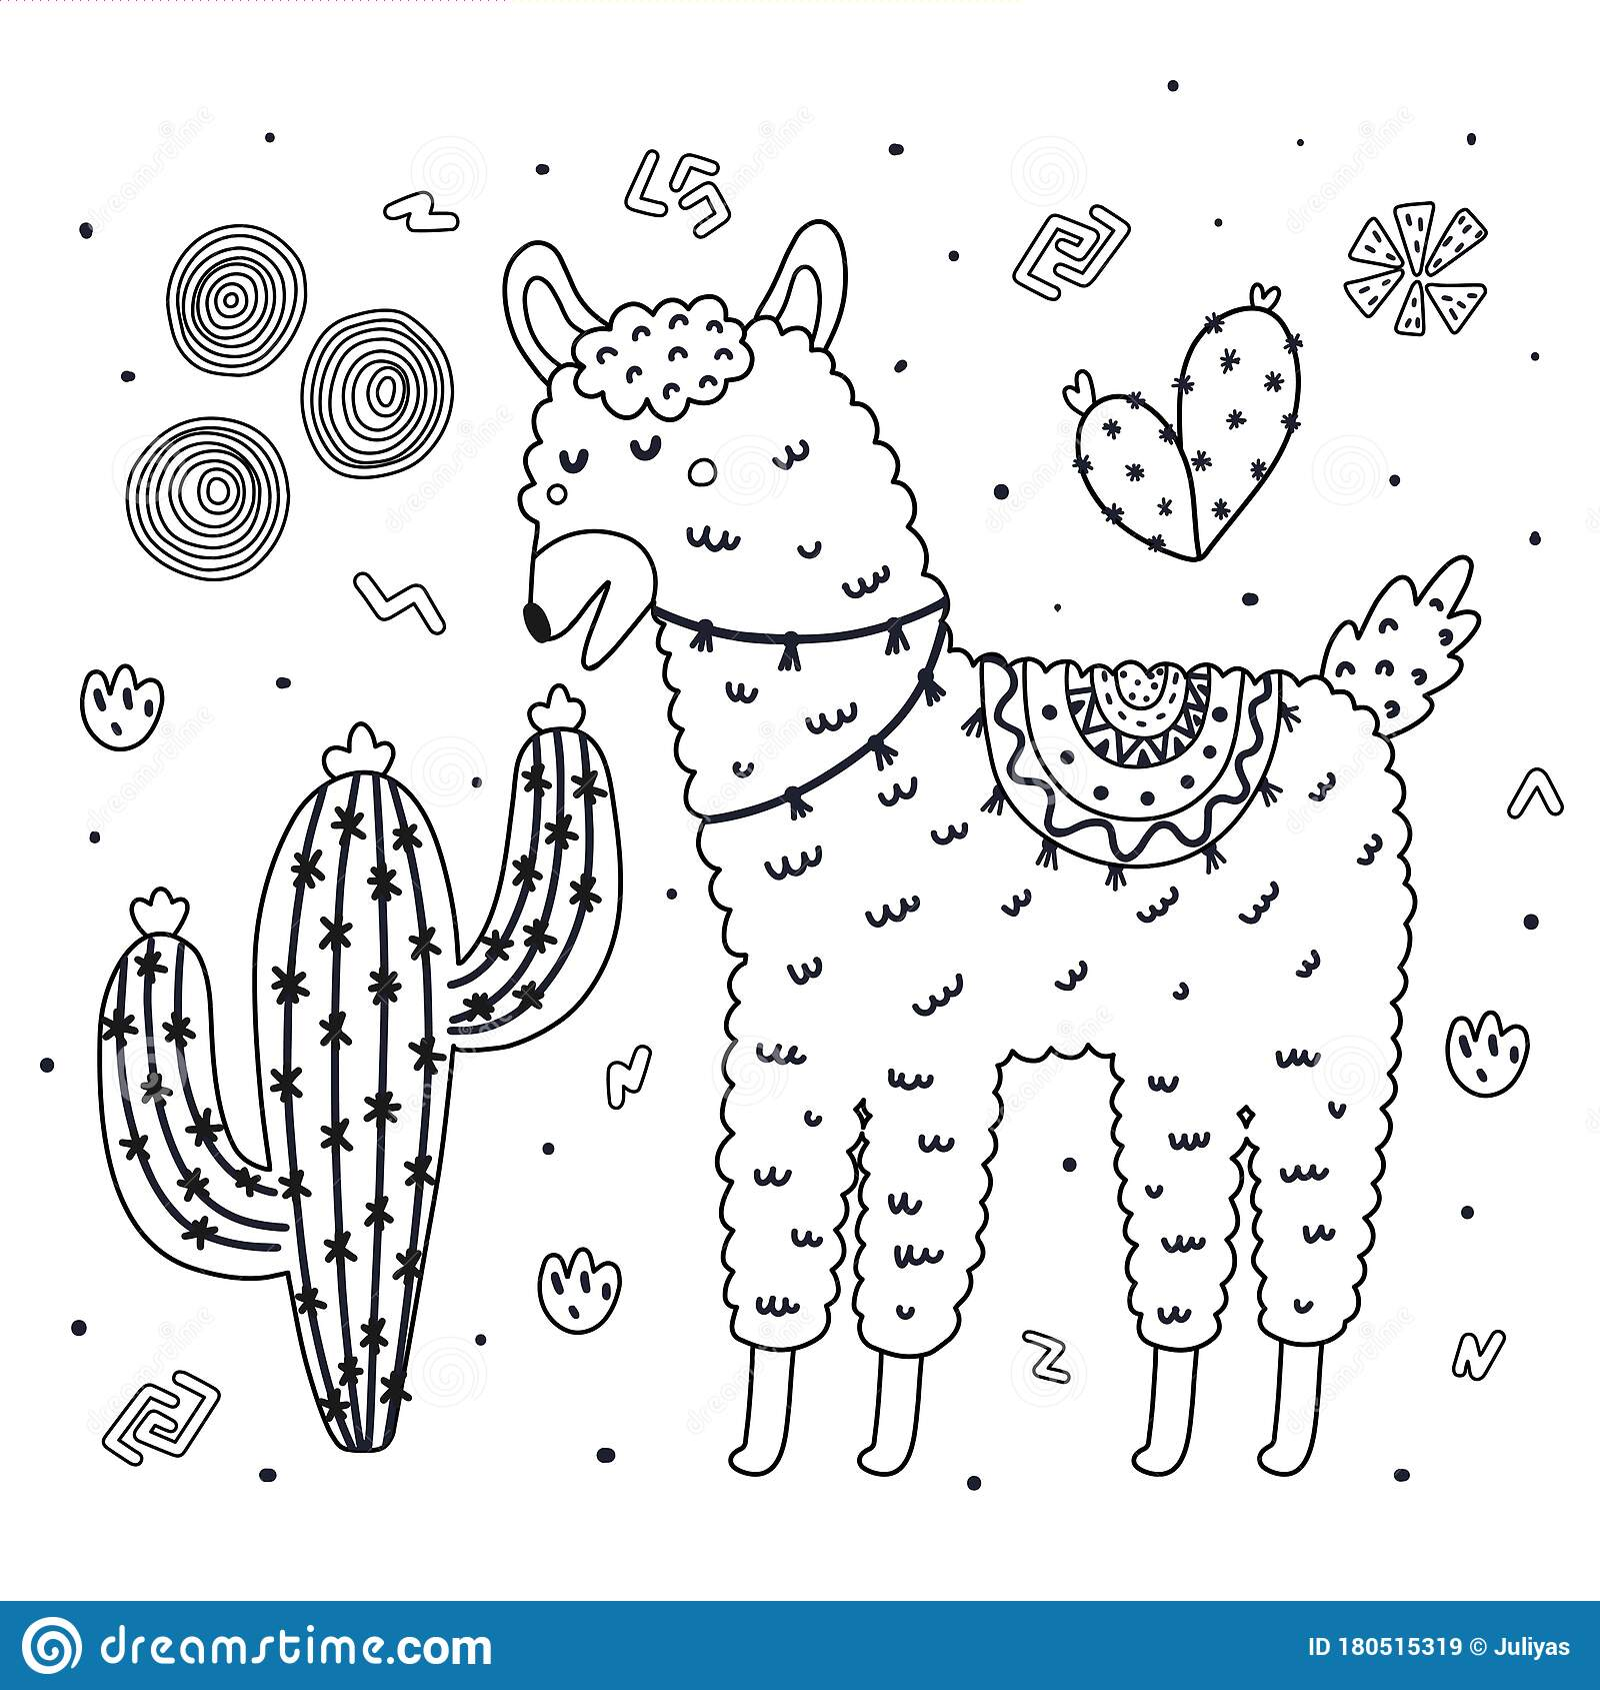 llama black white stock illustrations 841 llama black white stock illustrations vectors clipart dreamstime dreamstime com